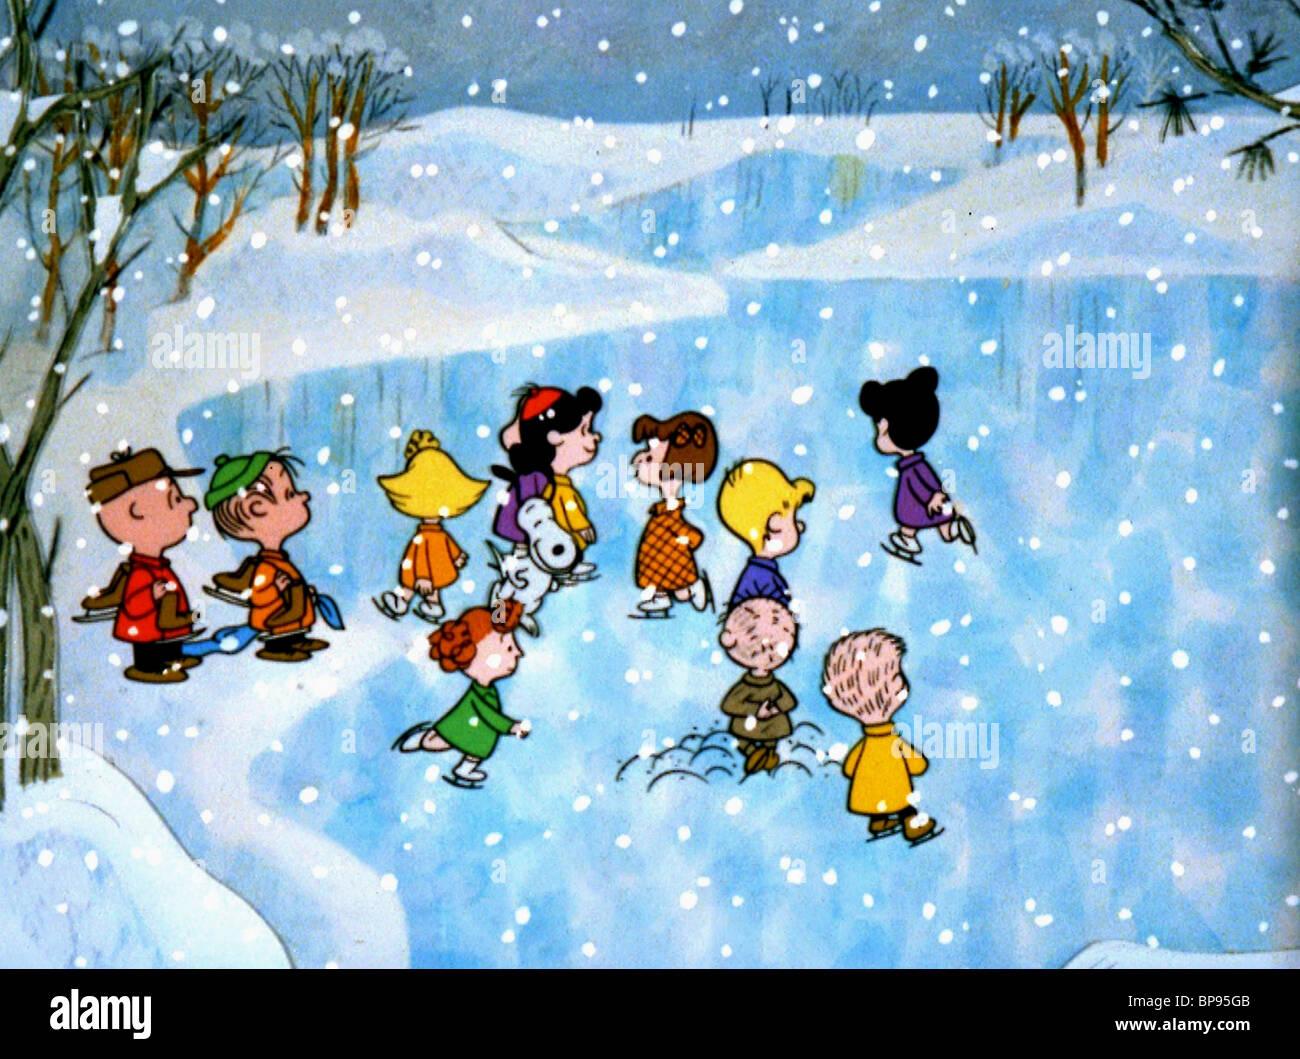 Christmas Charlie Brown.Charlie Brown Linus Snoopy Lucy A Charlie Brown